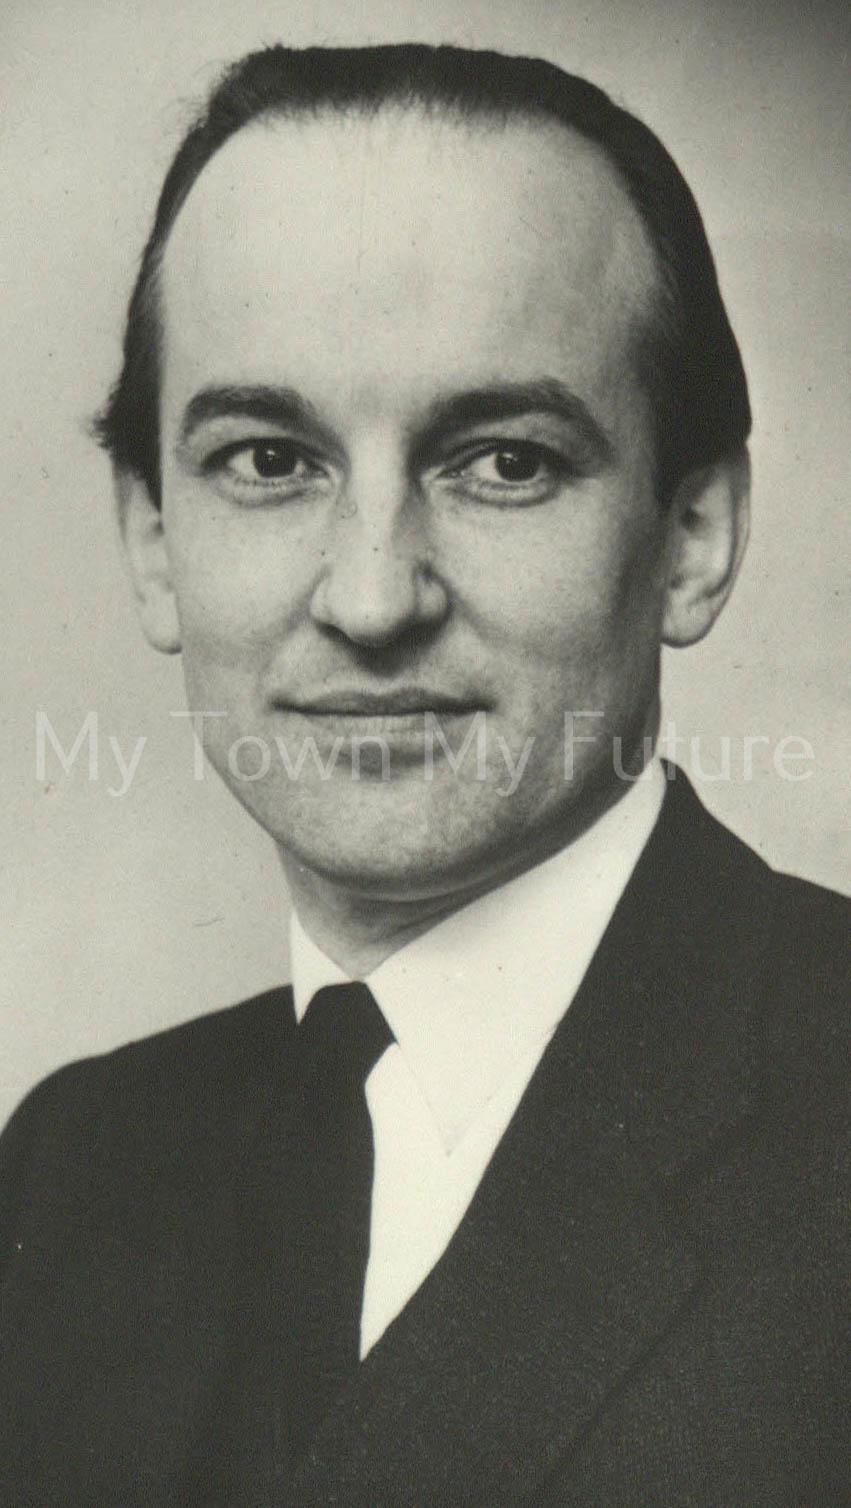 John Sutcliffe